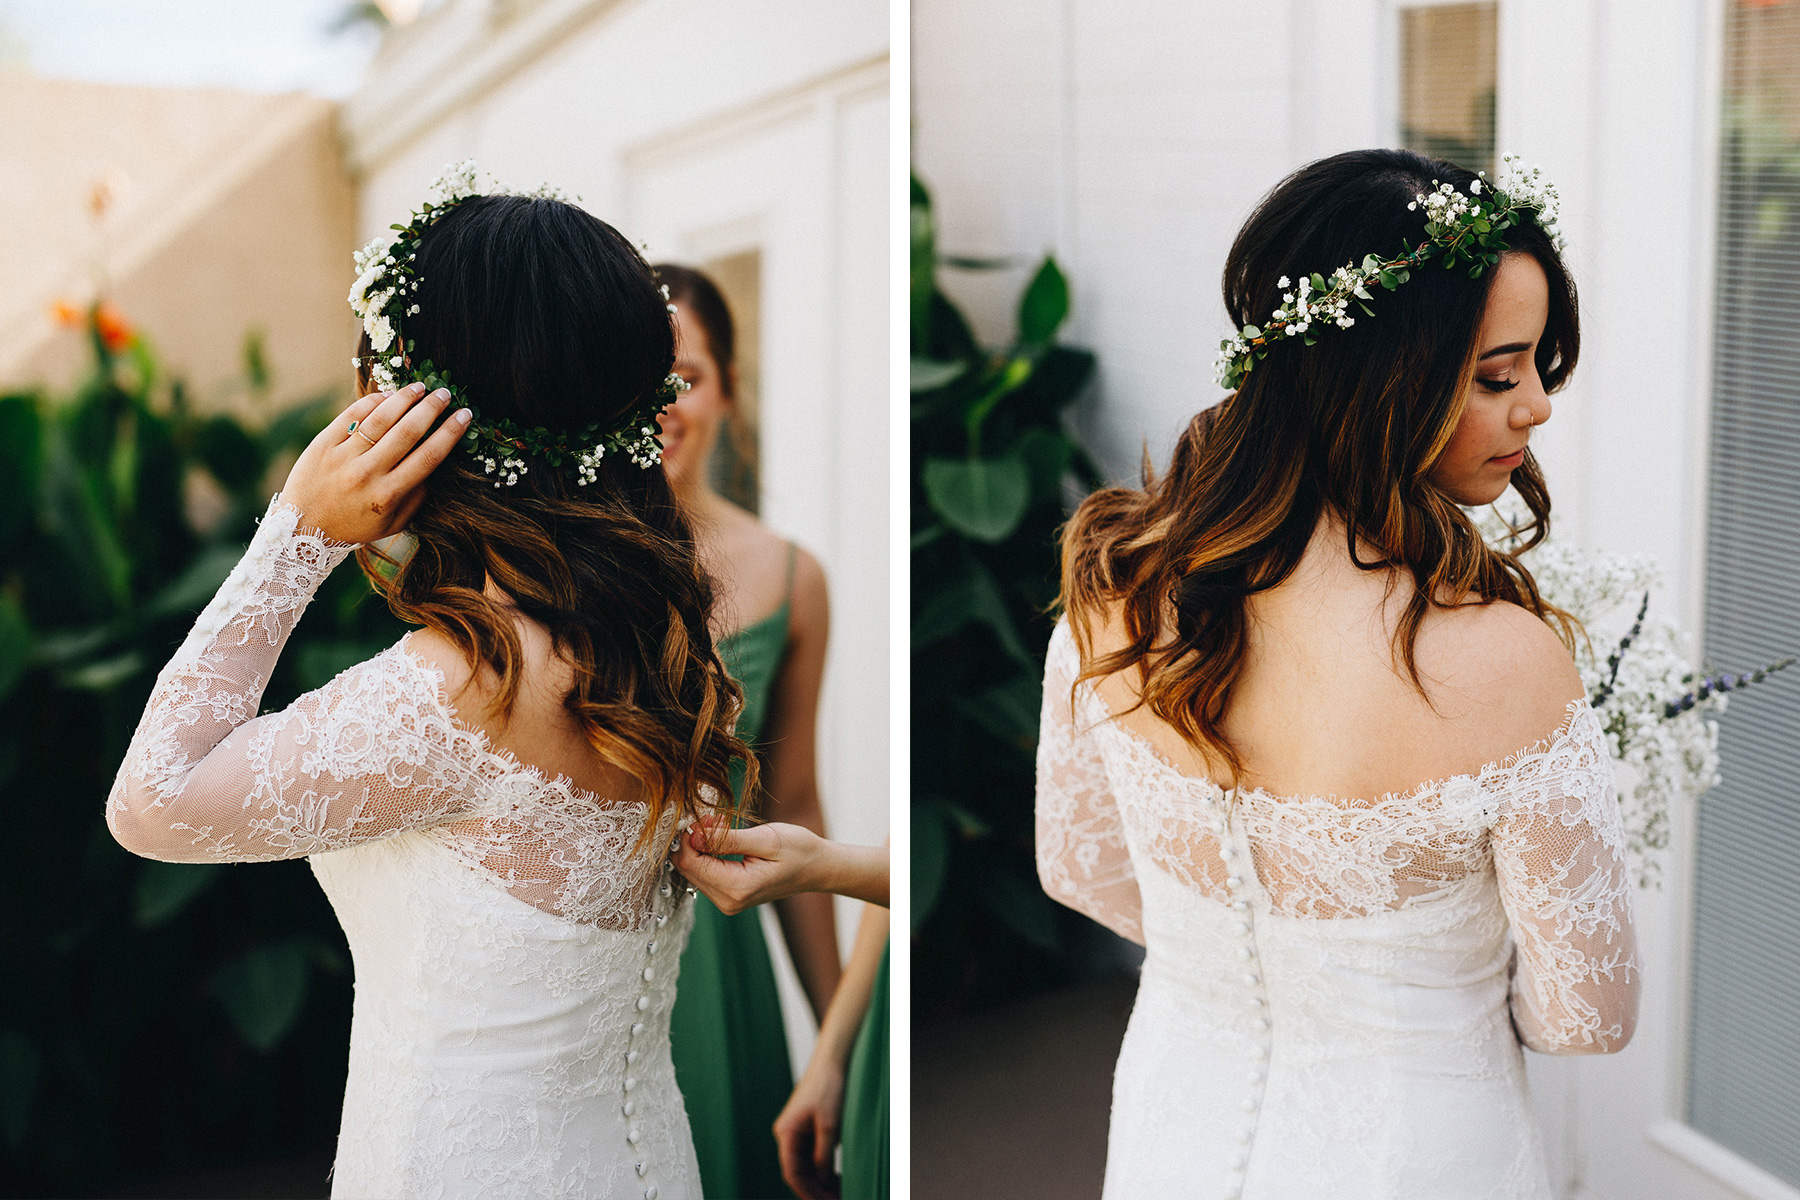 181104-Luxium-Weddings-Arizona-@matt__Le-Brandon-Kariana-Phoenix-Valley-Garden-Center-1015a.jpg